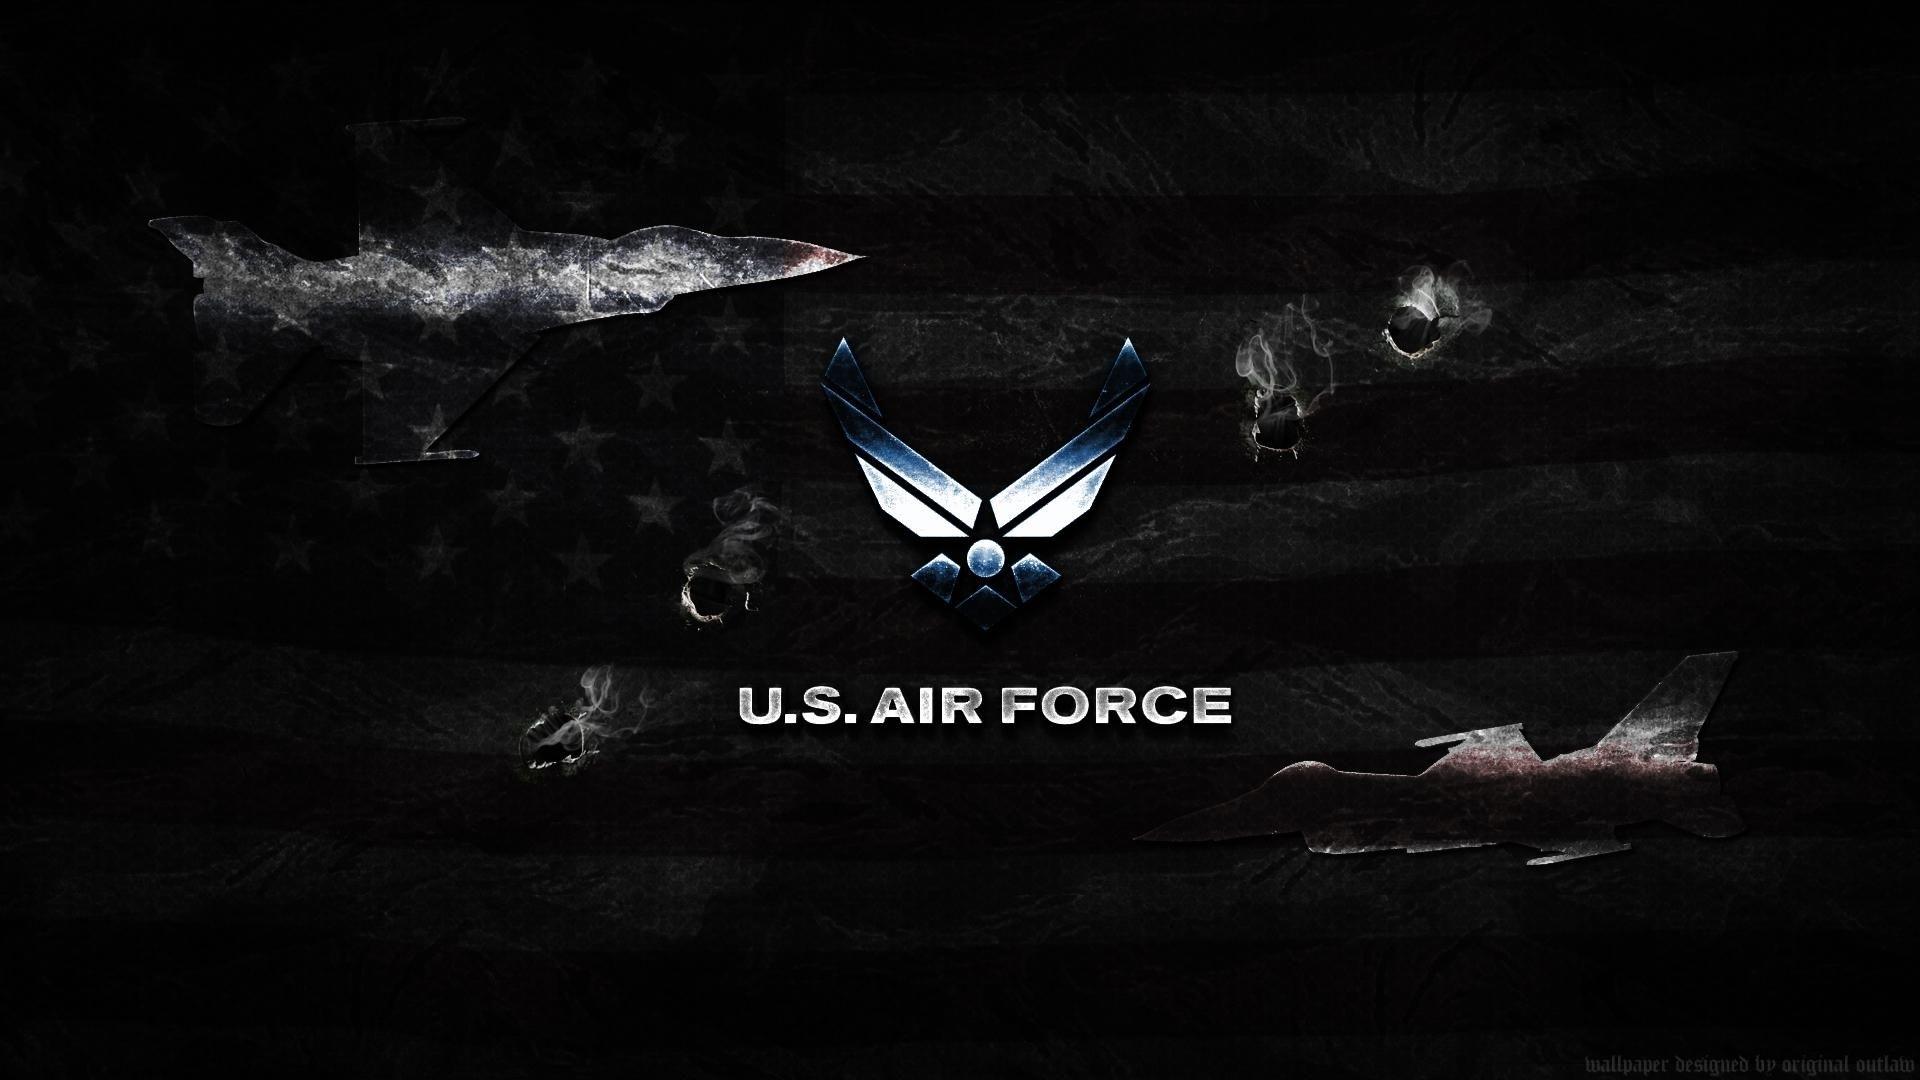 u.s.air force wallpaper | u.s.air force | pinterest | air force